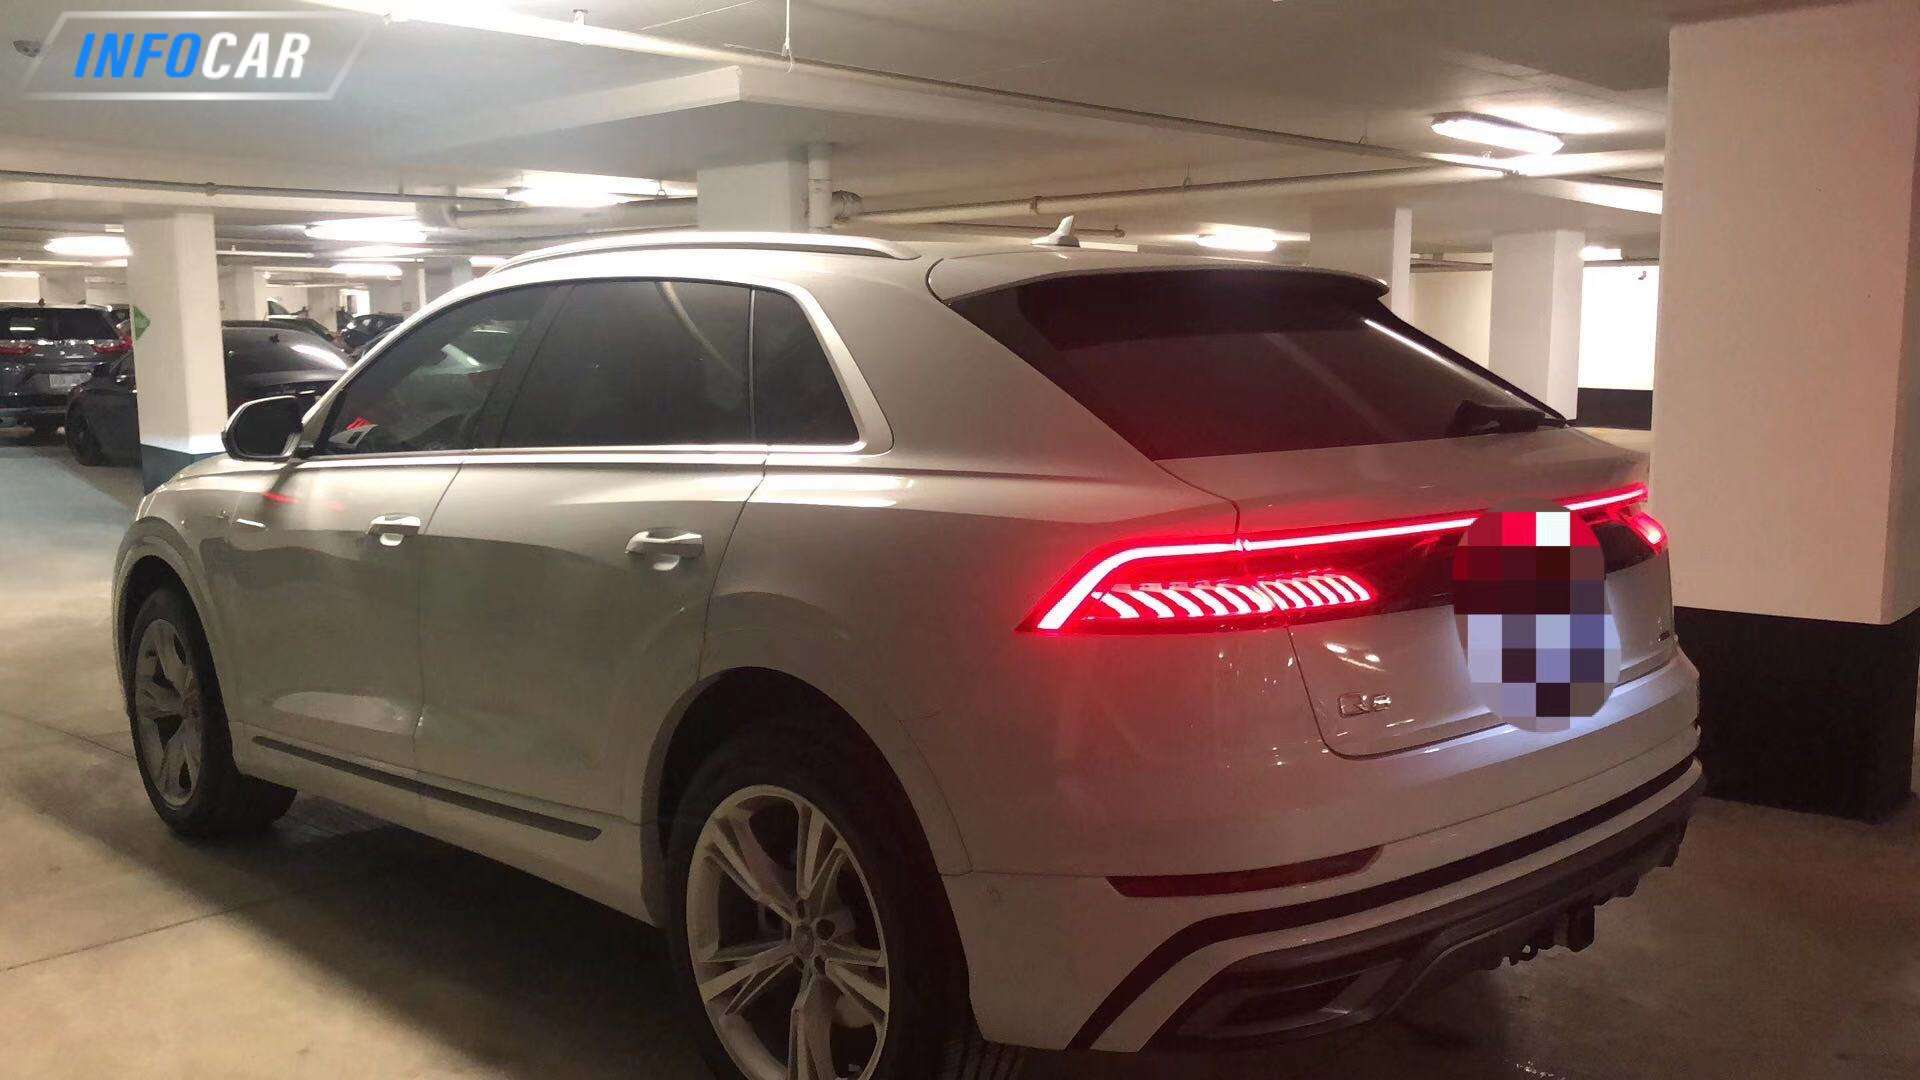 2019 Audi Q8 progressive+sline - INFOCAR - Toronto's Most Comprehensive New and Used Auto Trading Platform